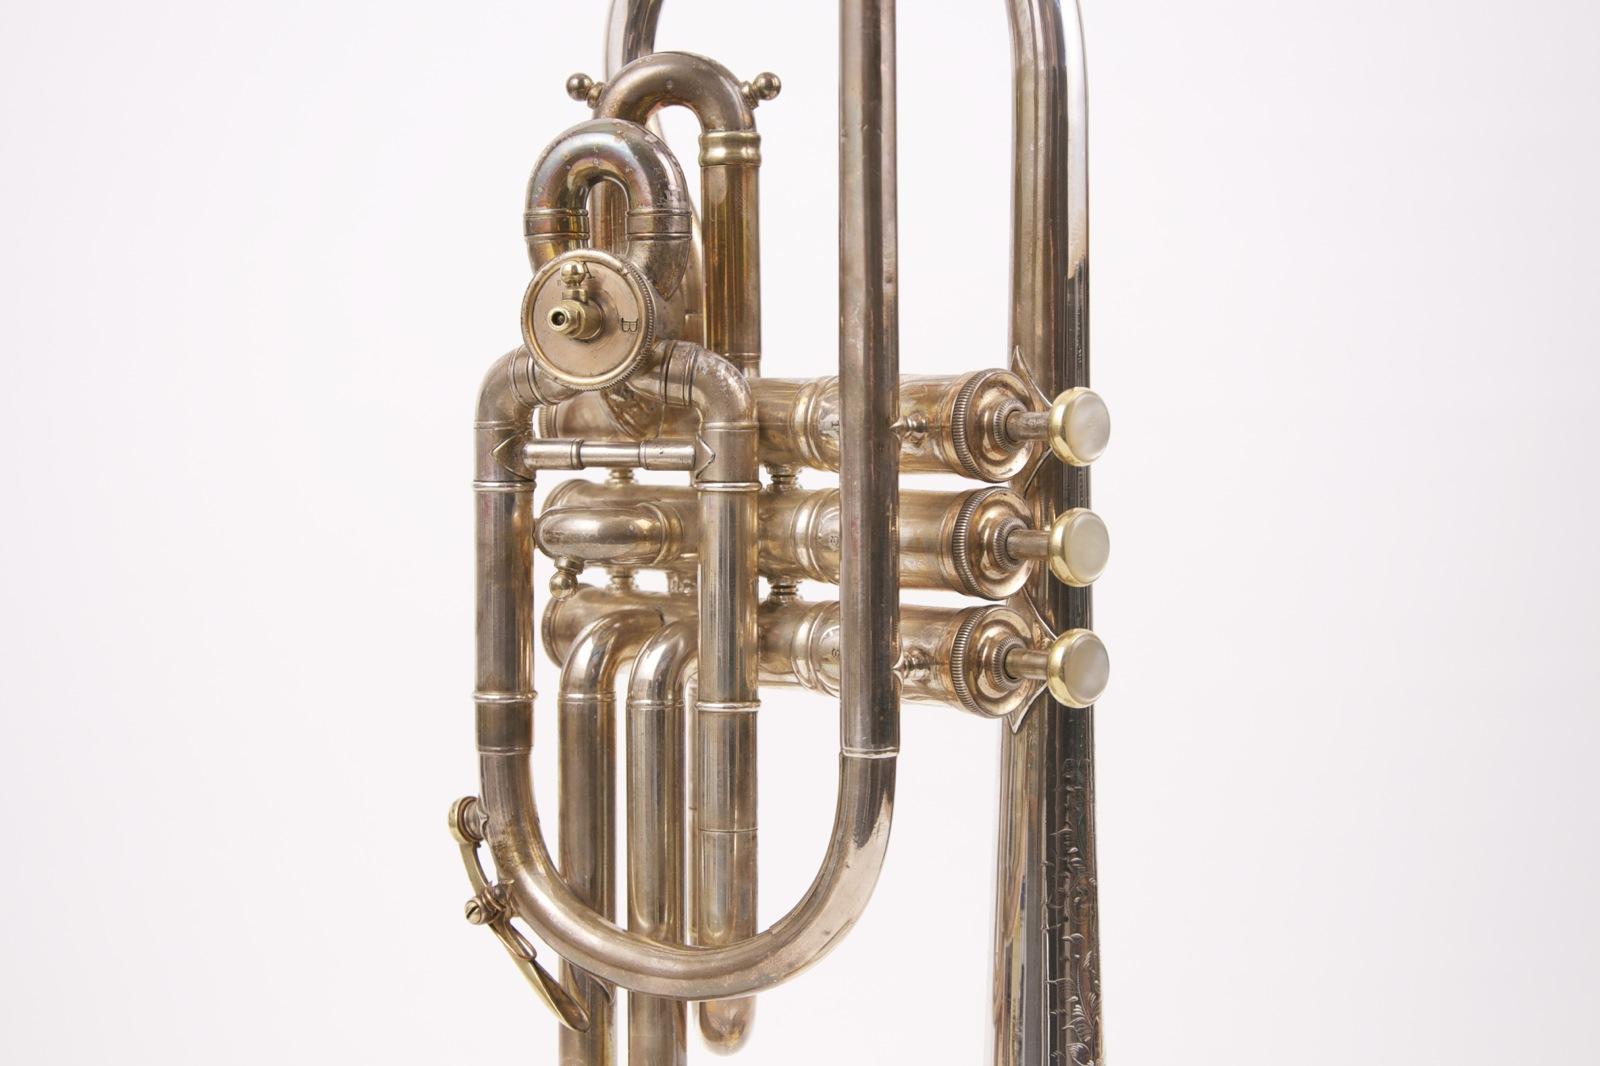 1335-cornet-C.-Keefer-07